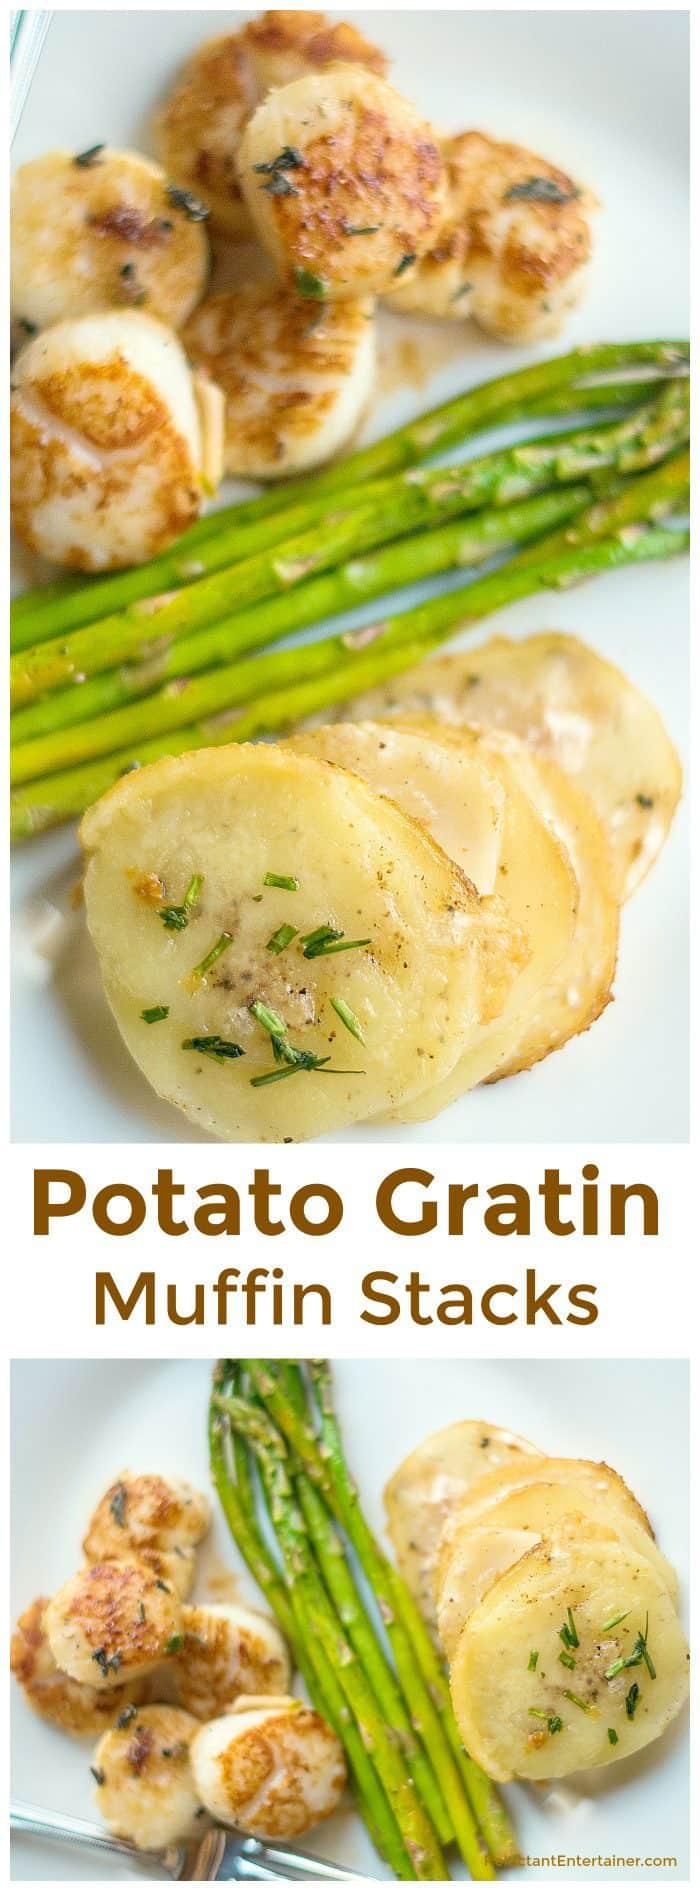 Potato Gratin Muffin Stacks Recipe